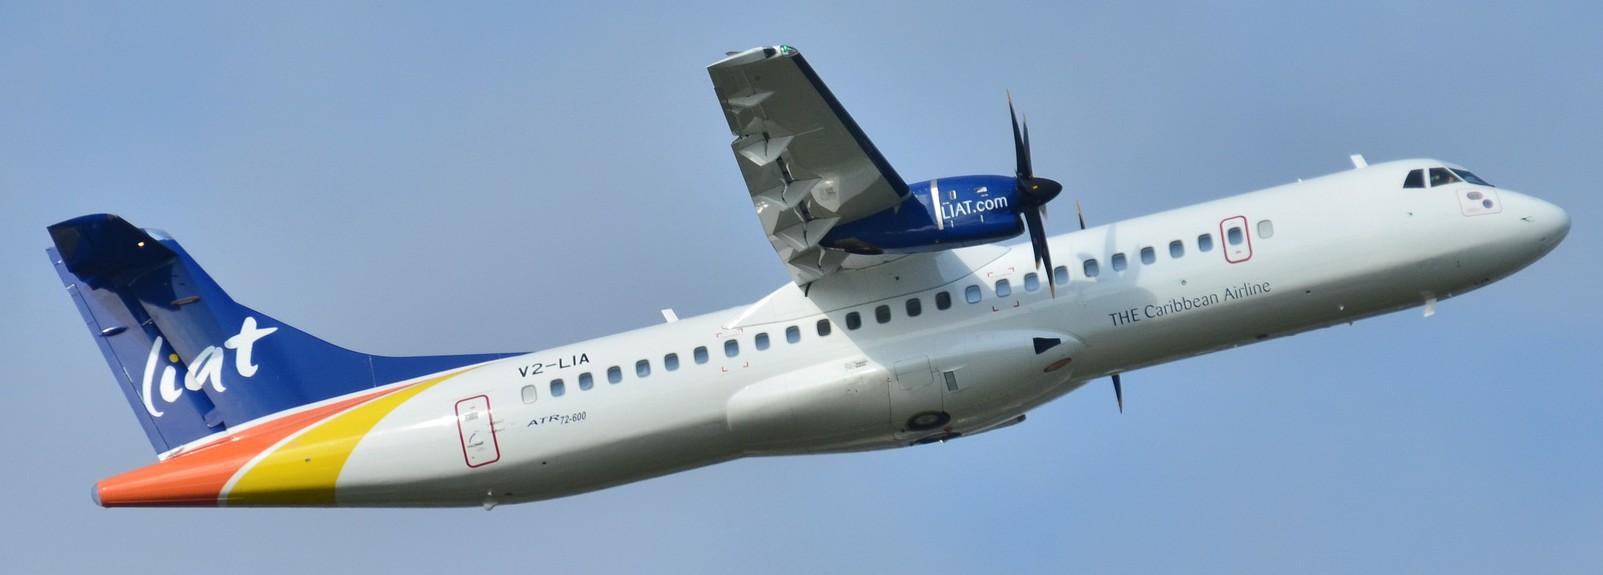 Liat Caribbean Airline Announce Flights To Haiti L Union